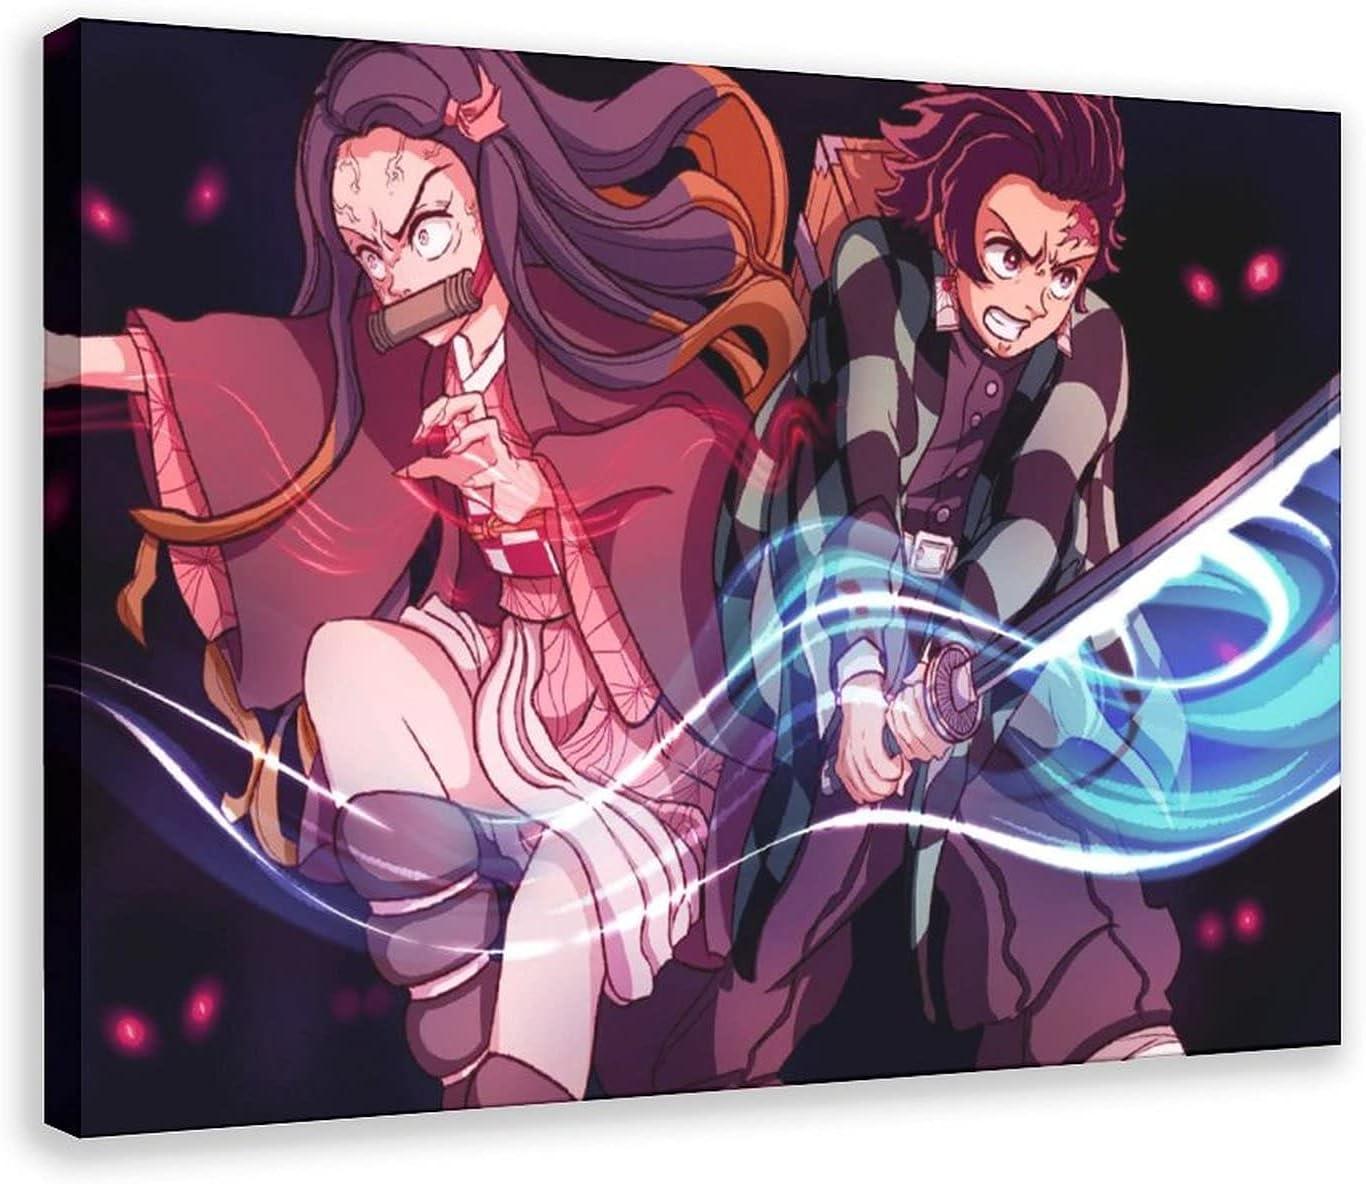 Demon Slayer Posters Anime Finally resale Tulsa Mall start 6 Art Poster Canvas